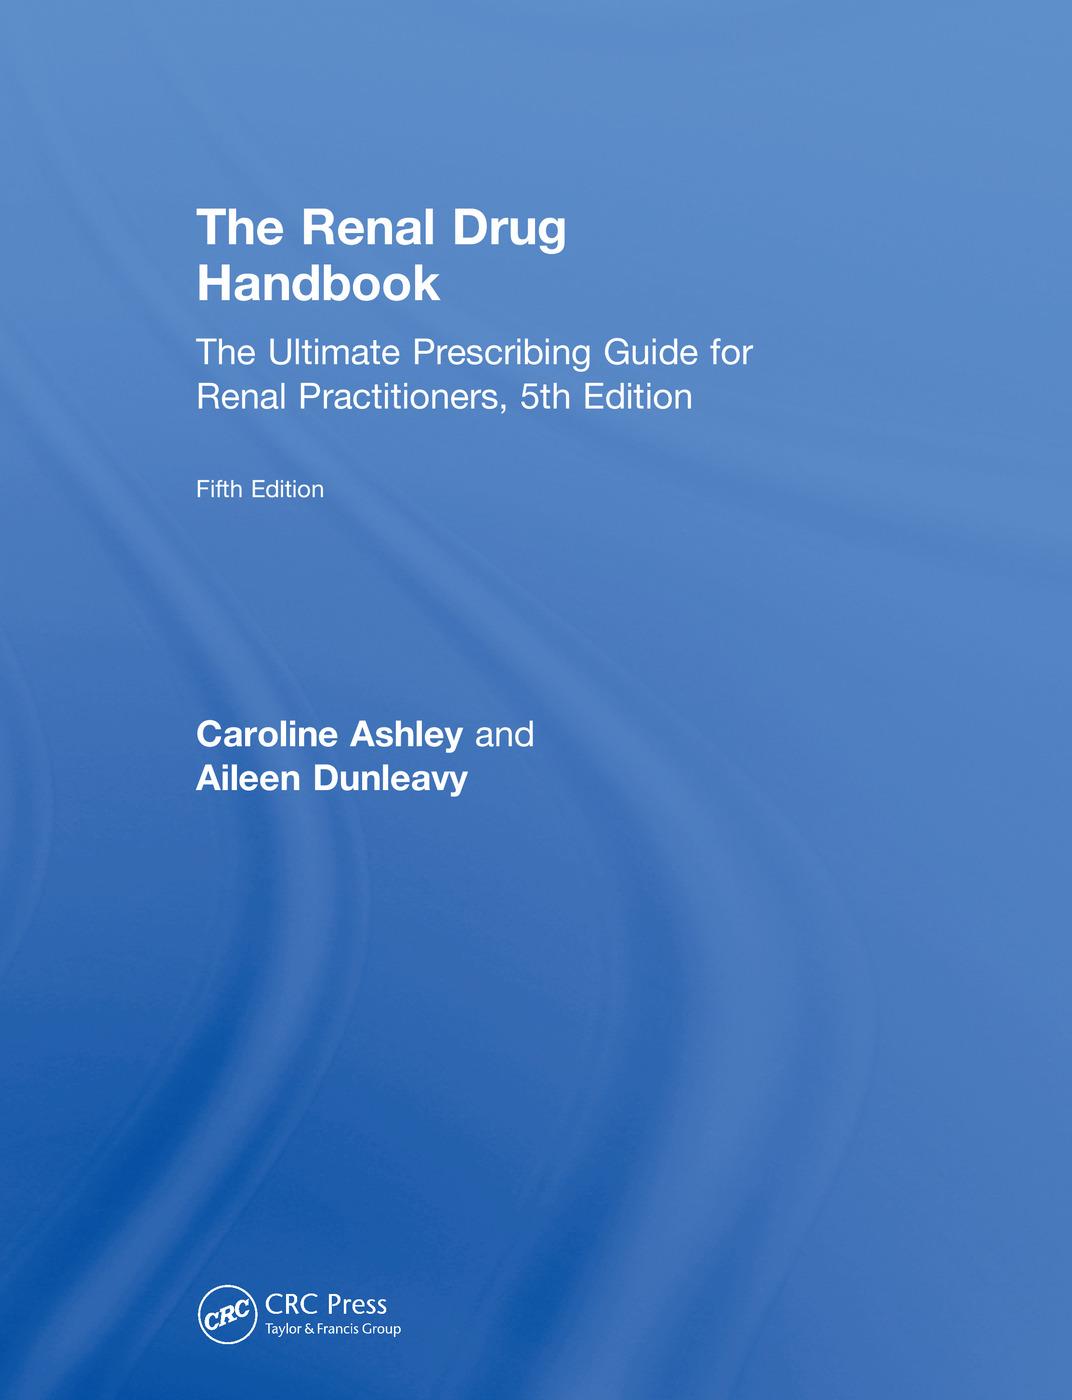 The Renal Drug Handbook | The Ultimate Prescribing Guide for Renal